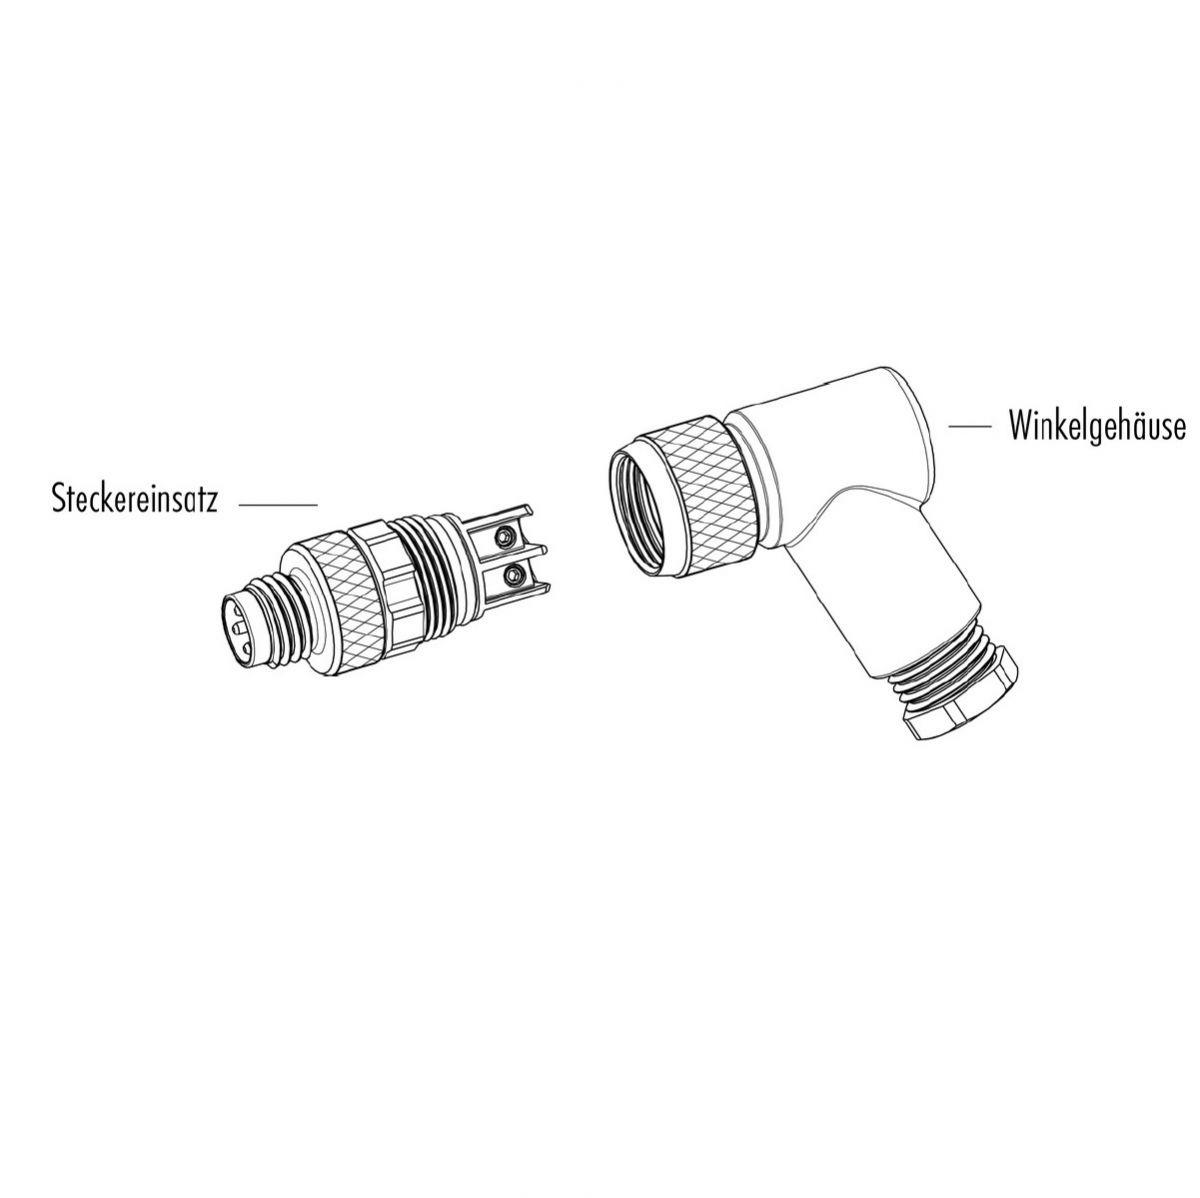 M8 3 Pole Angle Male Connector